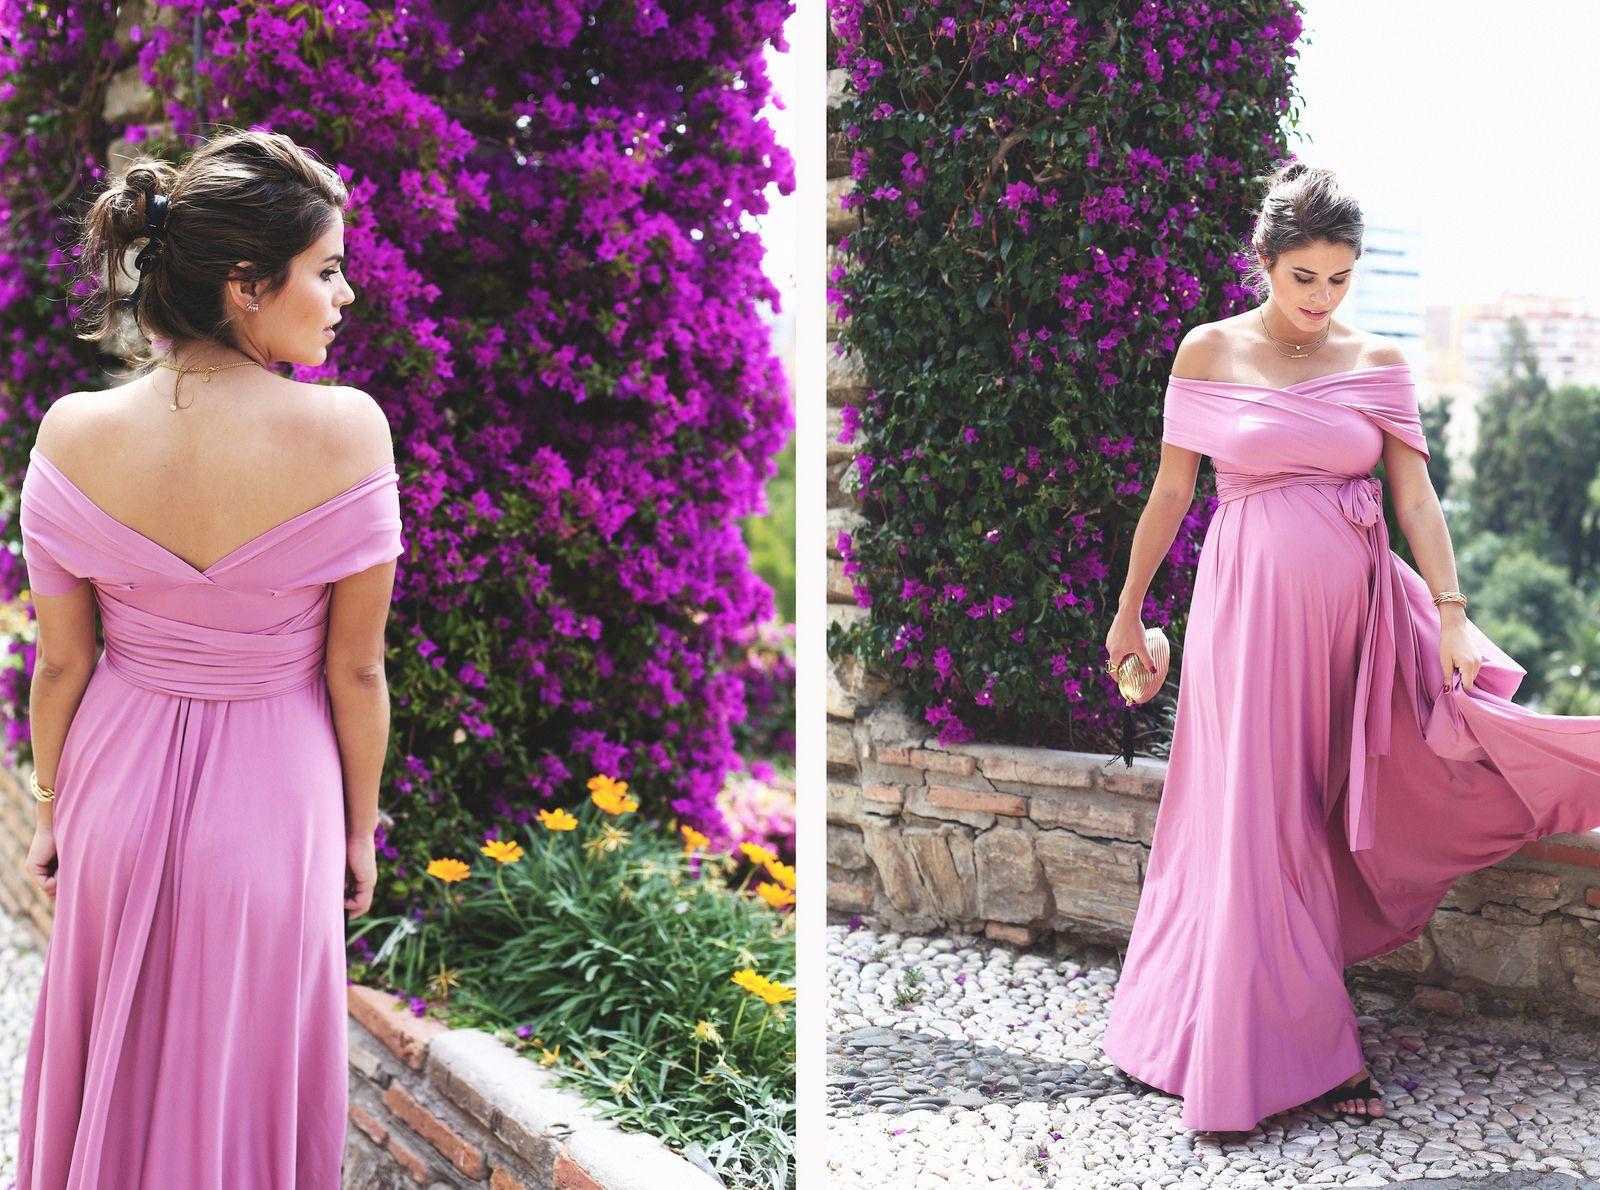 Jessie Chanes (seamsforadesire) - vestido rojo carmesi cotton candy